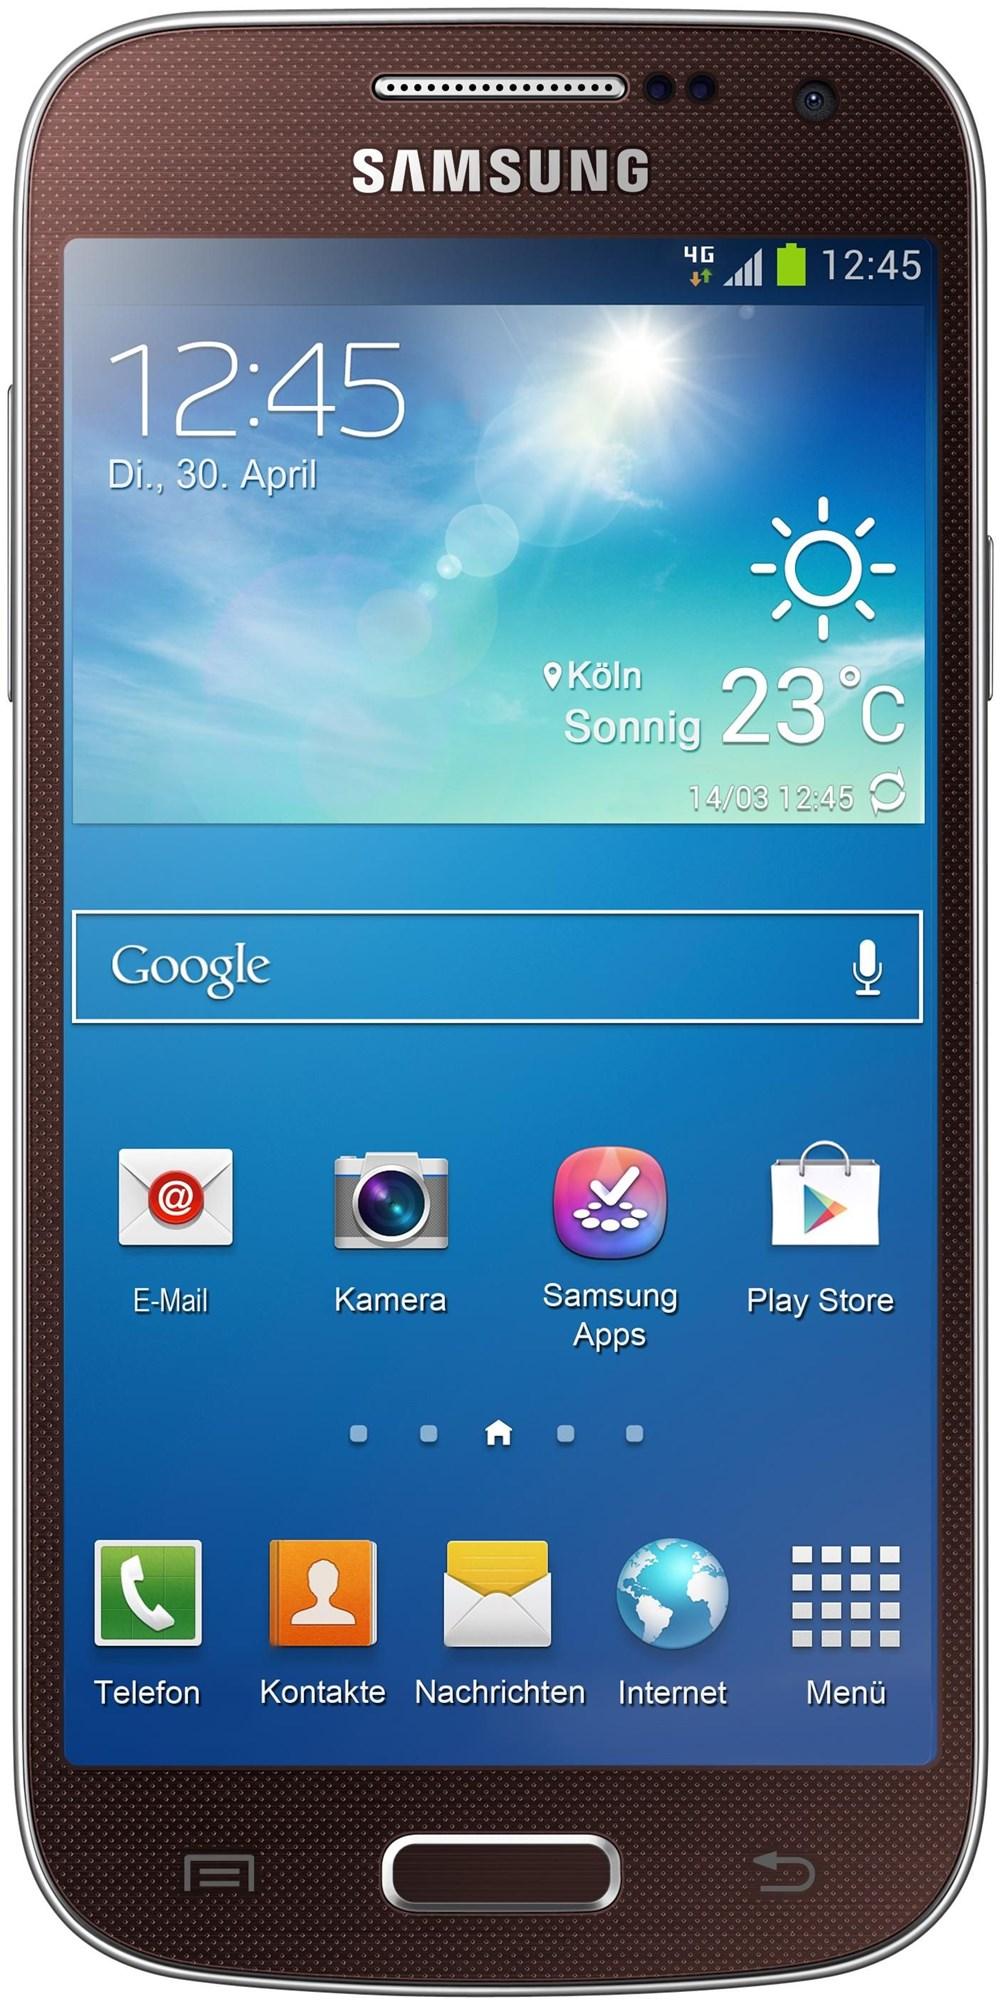 Samsung Galaxy S4 Mini i9195, 8 GB, Smartphone ohne Vertrag/SIMlock, braun GT-I9195ZNADBT